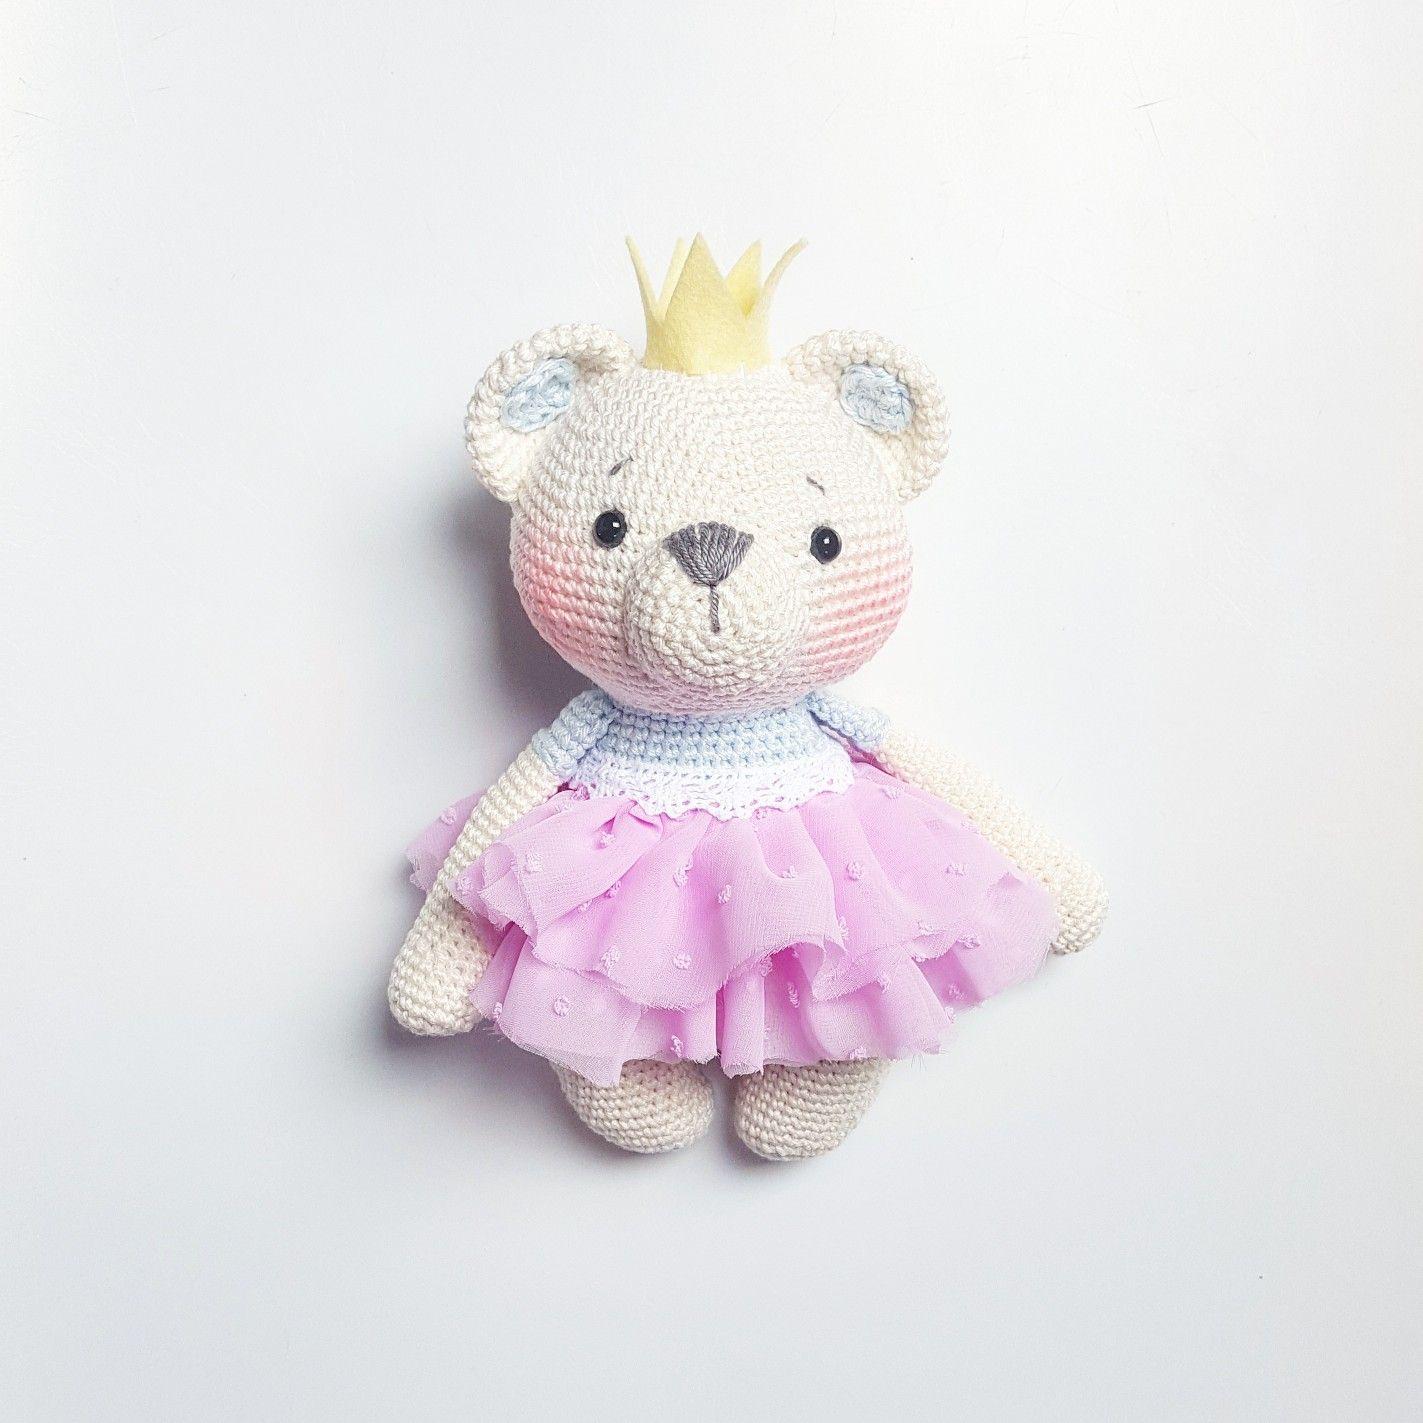 Amigurumi Teddy Bär Pattern Amalou.Designs | crochet toys ...